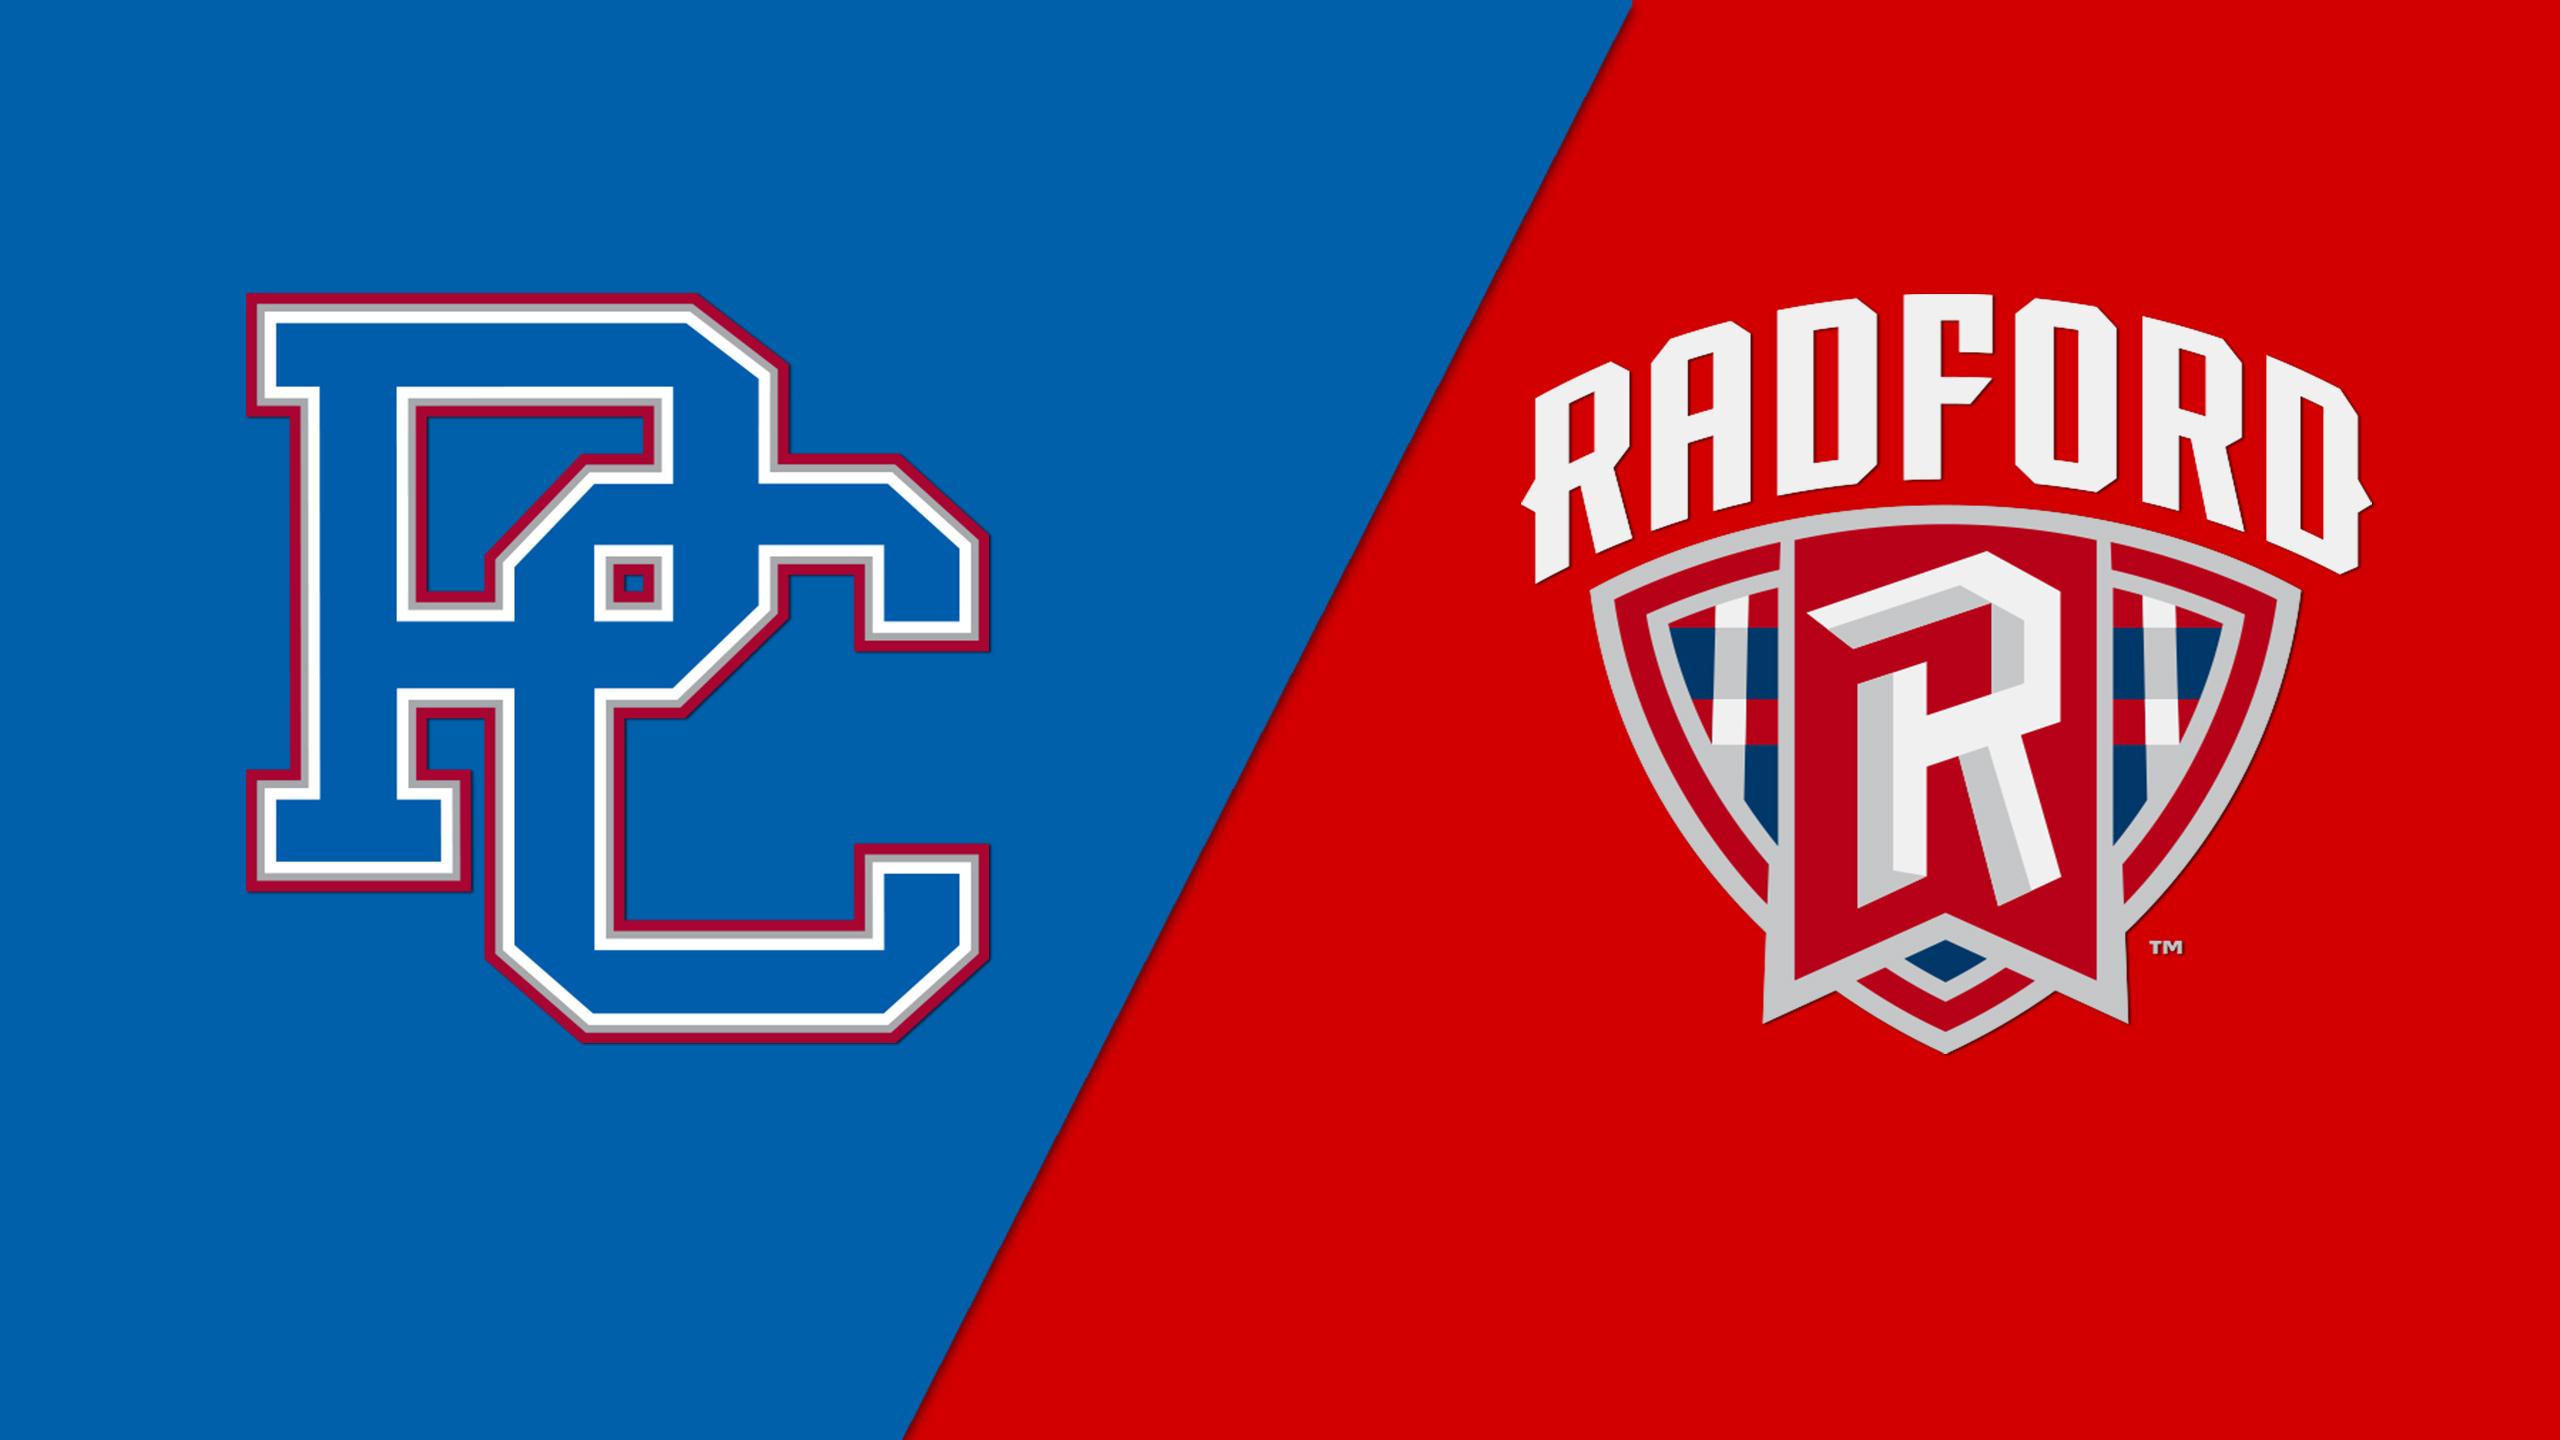 Presbyterian vs. Radford (Quarterfinal #1) (Big South Women's Basketball Championship)